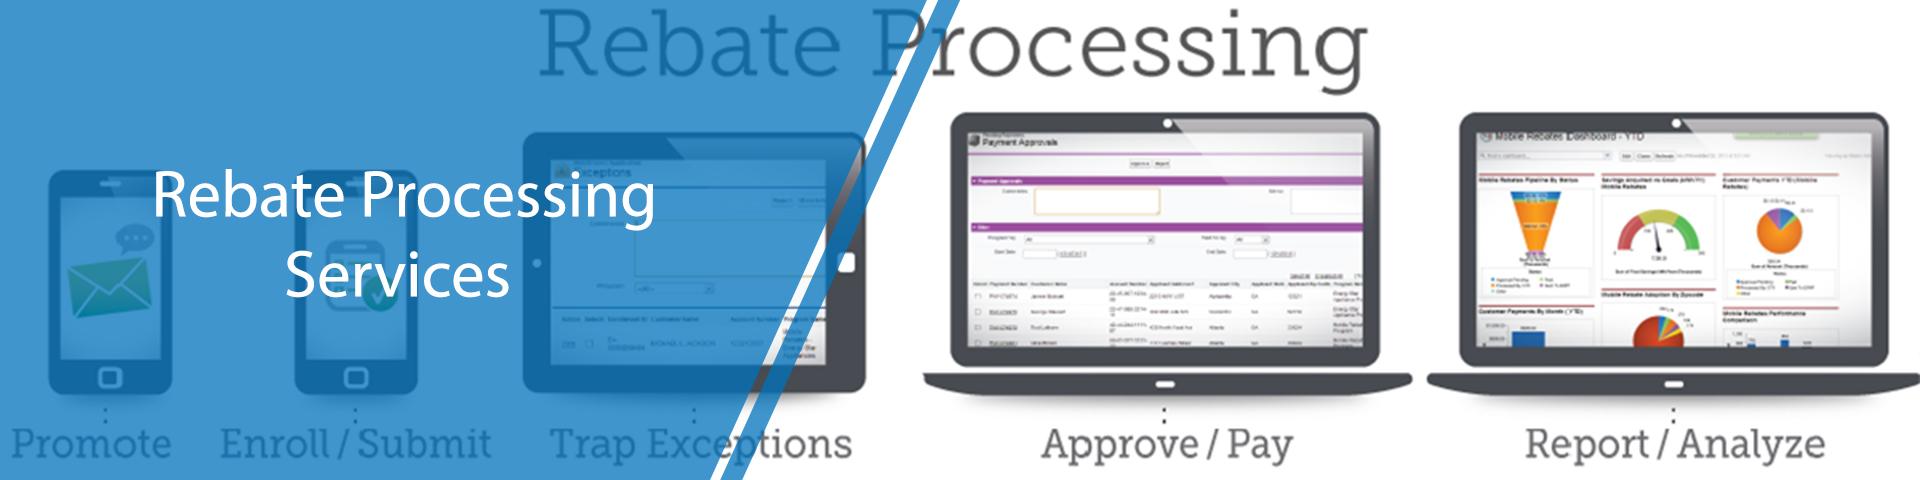 Rebate Processing Services